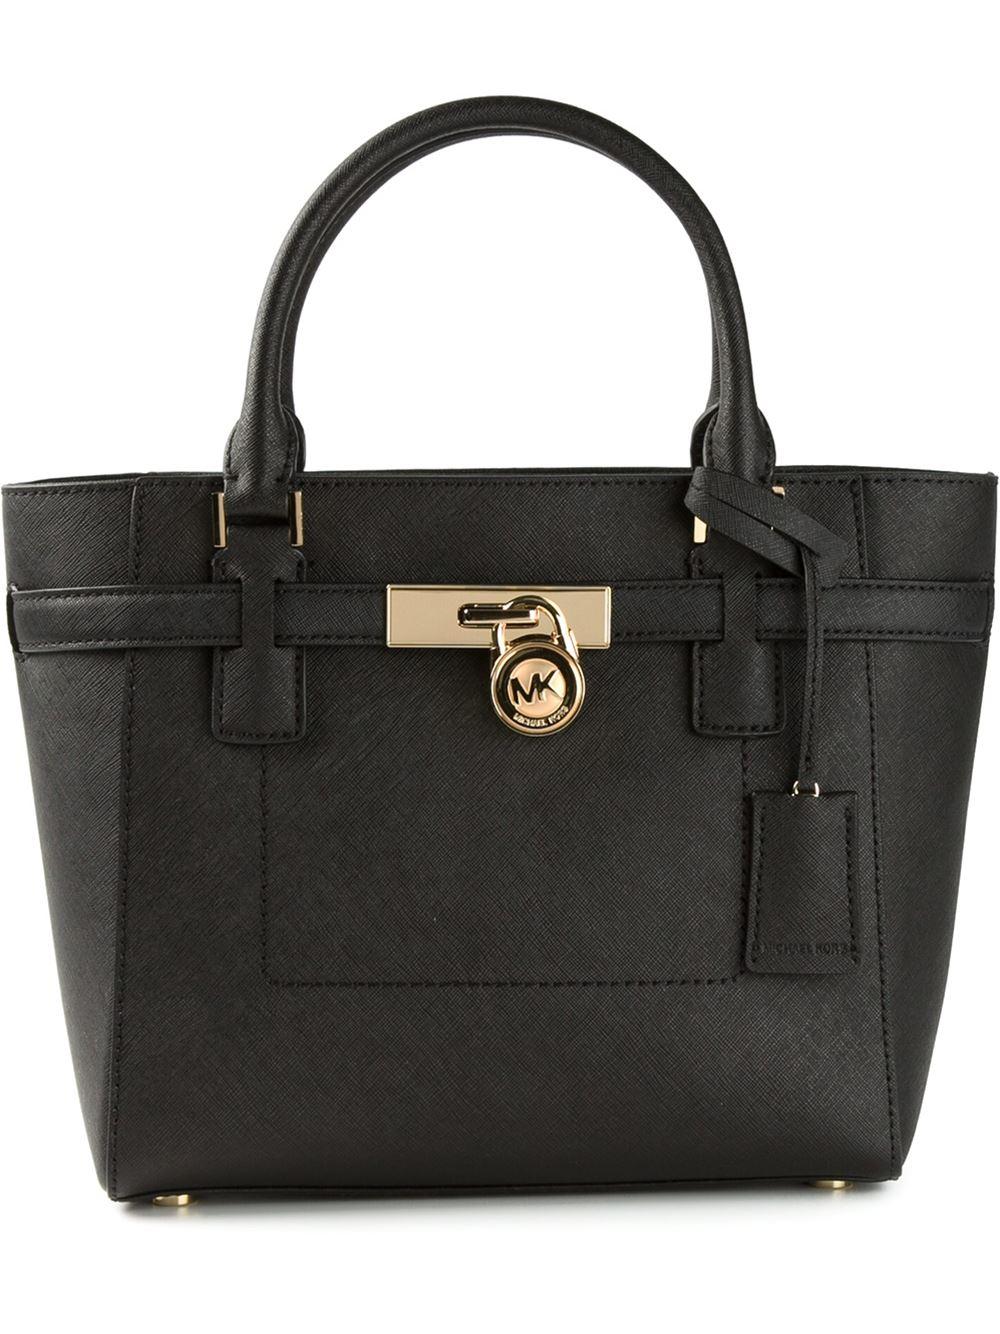 michael michael kors 39 hamilton 39 medium satchel in black lyst. Black Bedroom Furniture Sets. Home Design Ideas